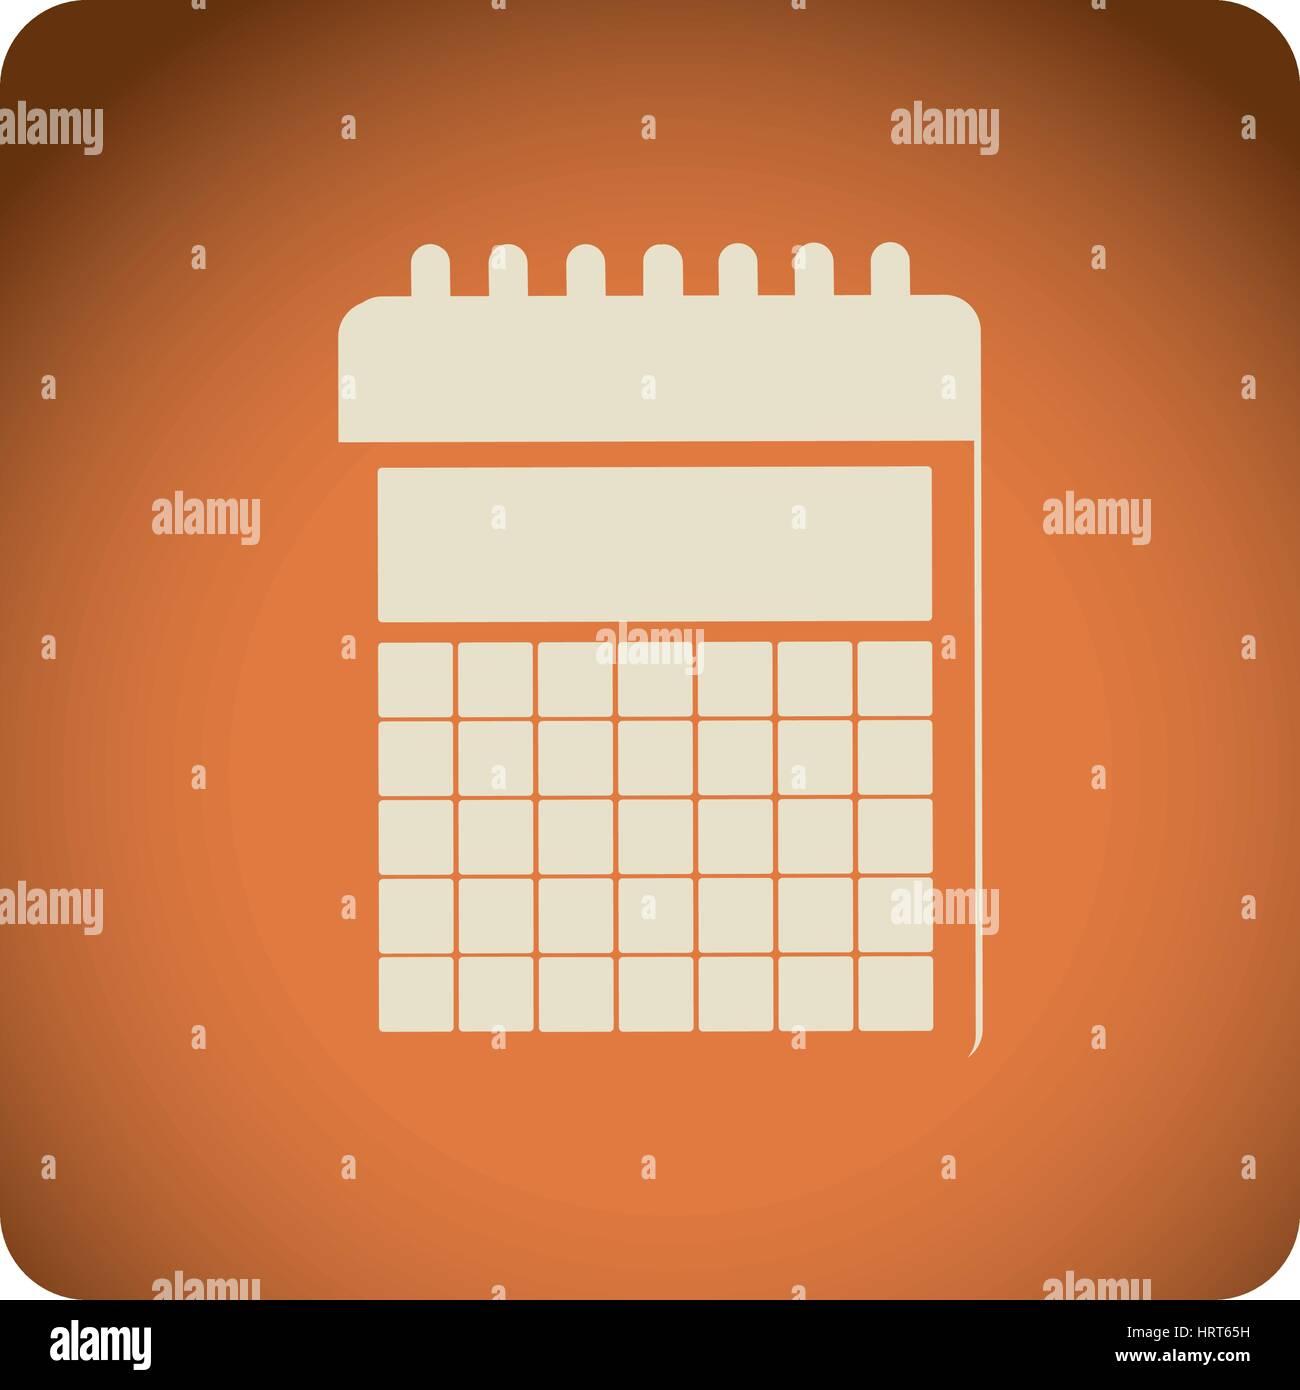 orange emblem calendar icon Stock Vector